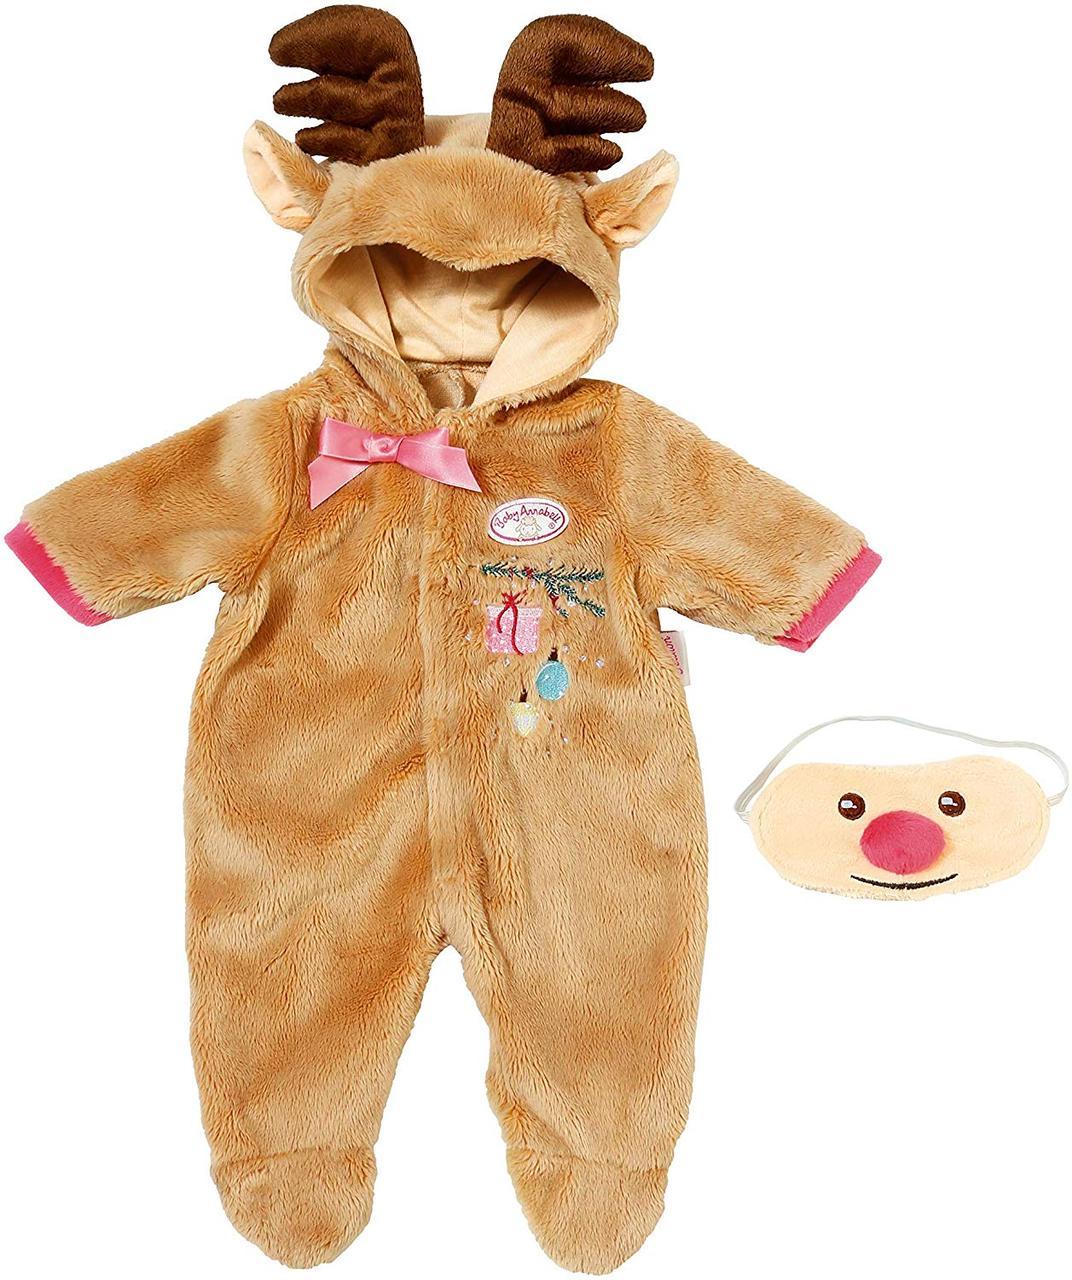 Одежда для Беби Борн Baby Born костюм оленя Zapf Creation 701157